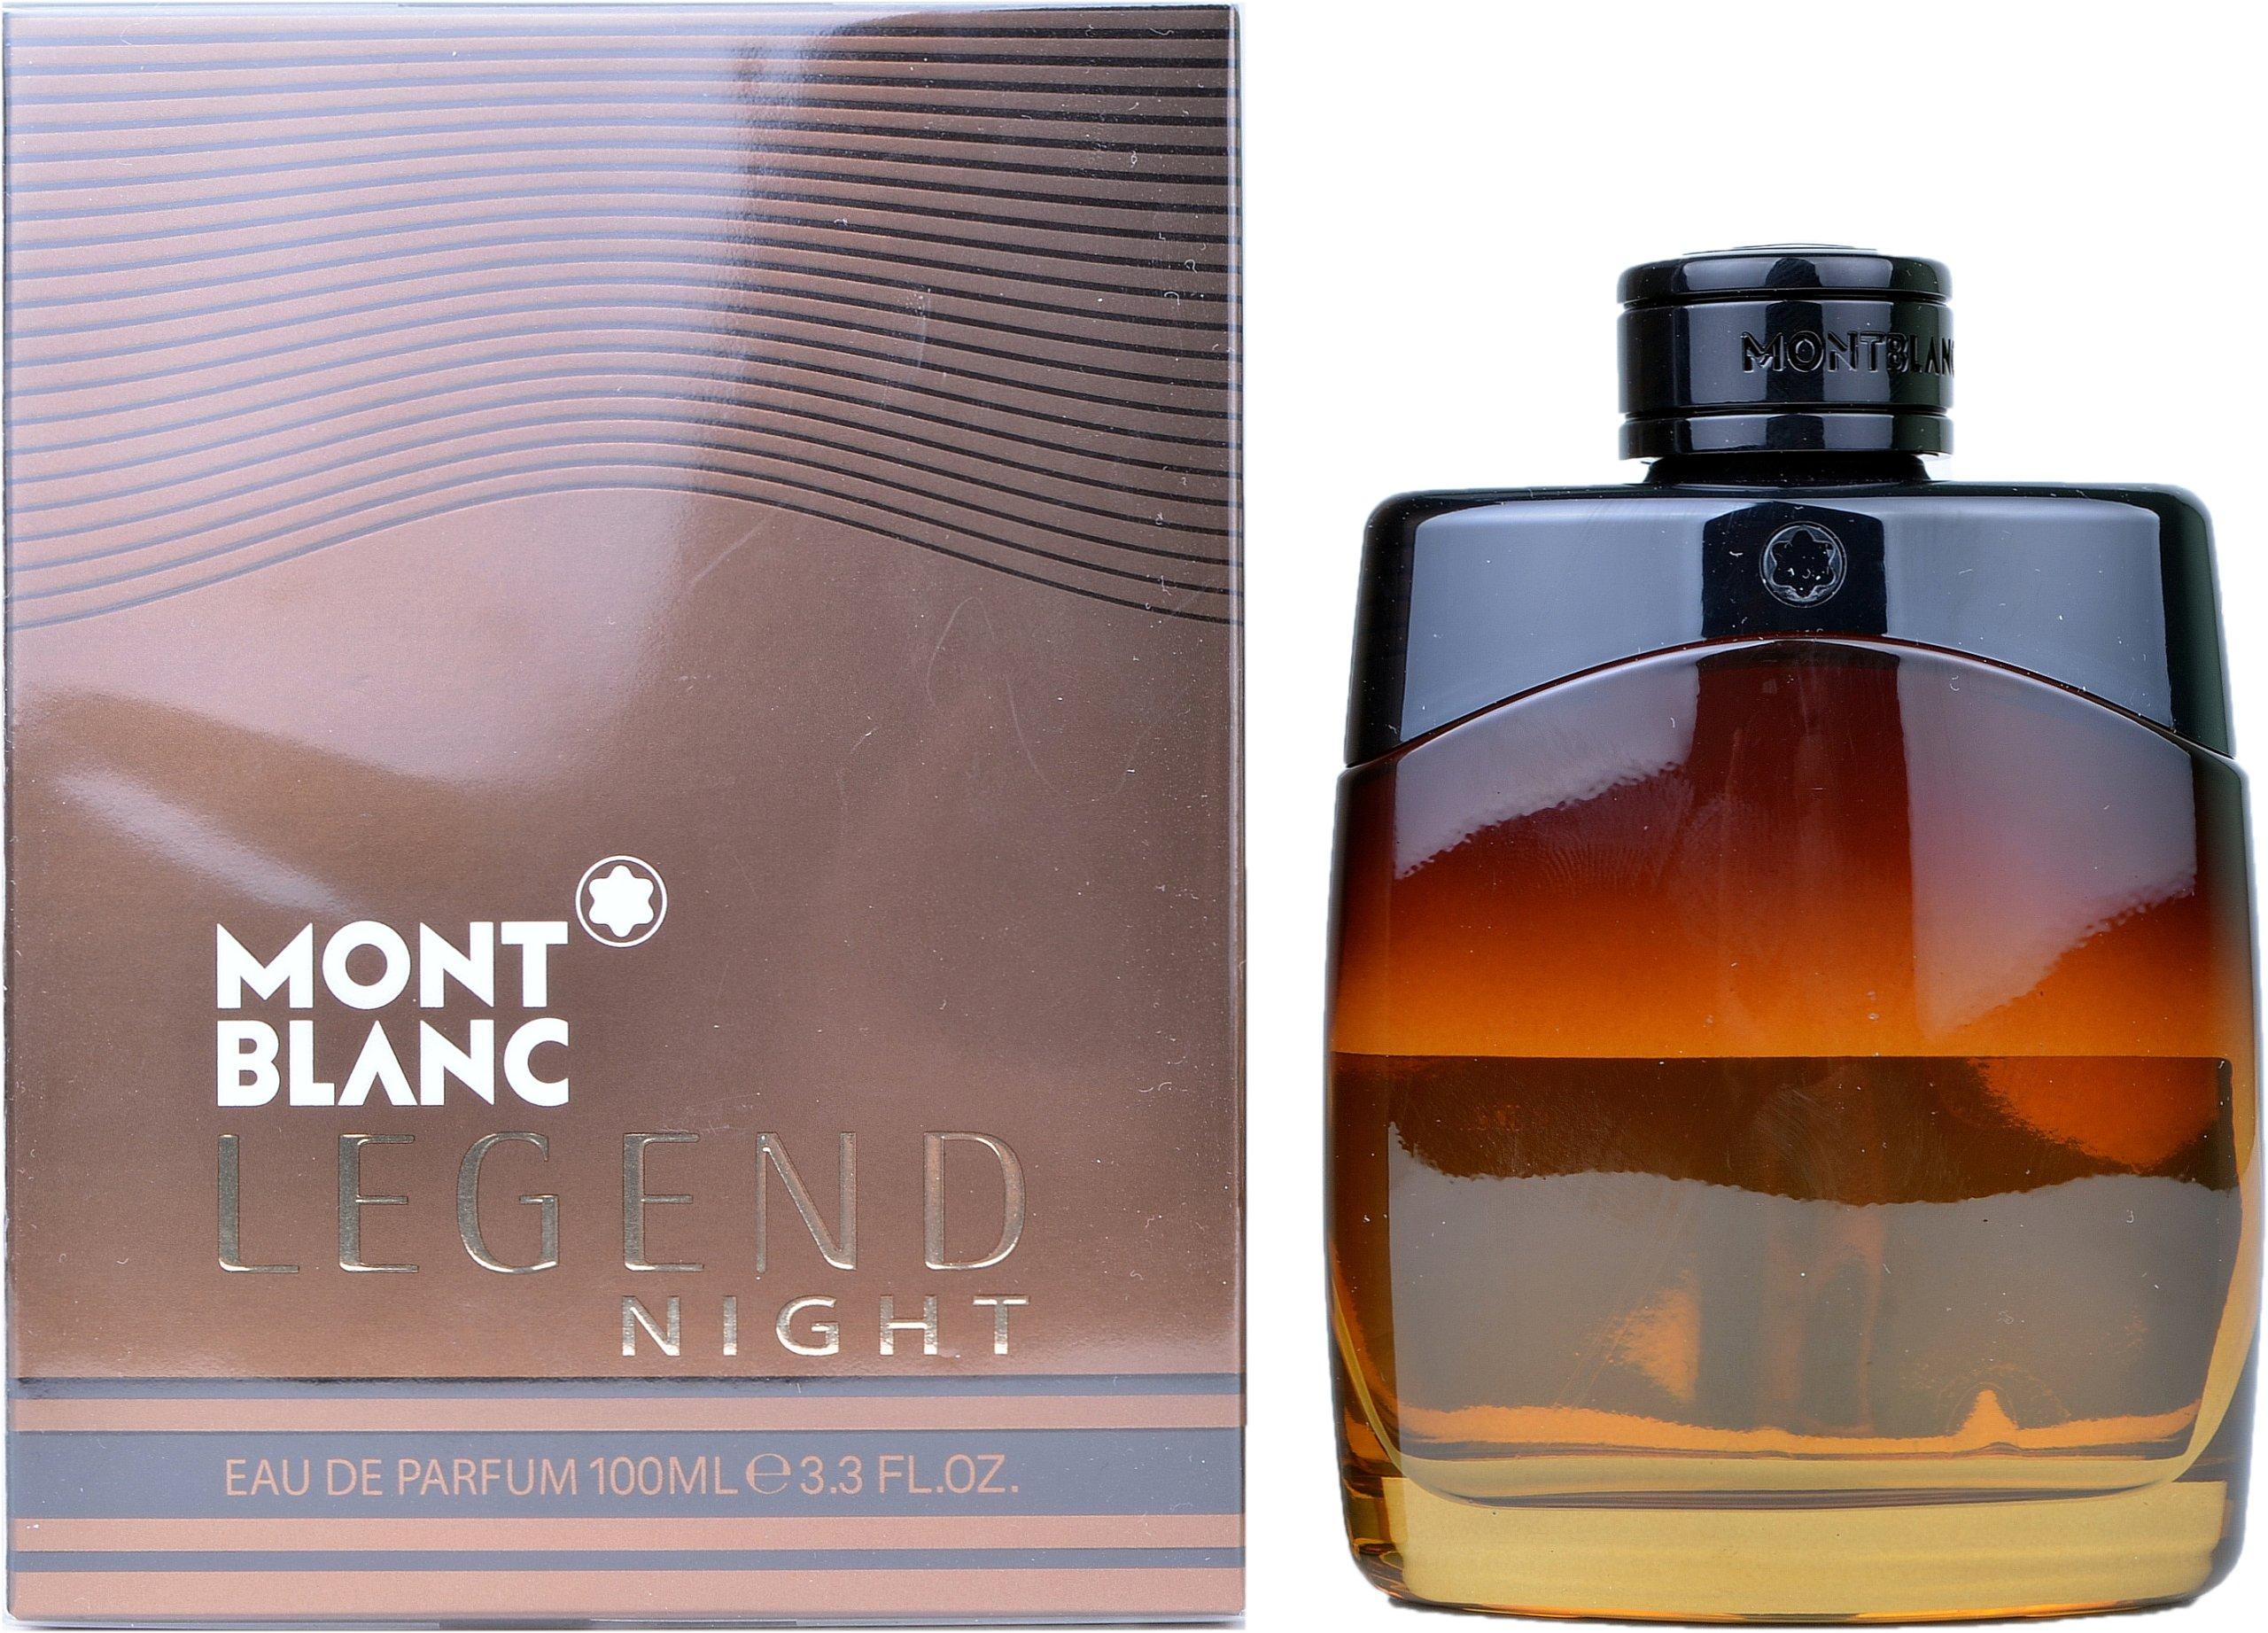 Mont Blanc Legend Night 100ml Edp Men Produkt 7167798777 Parfum Original For